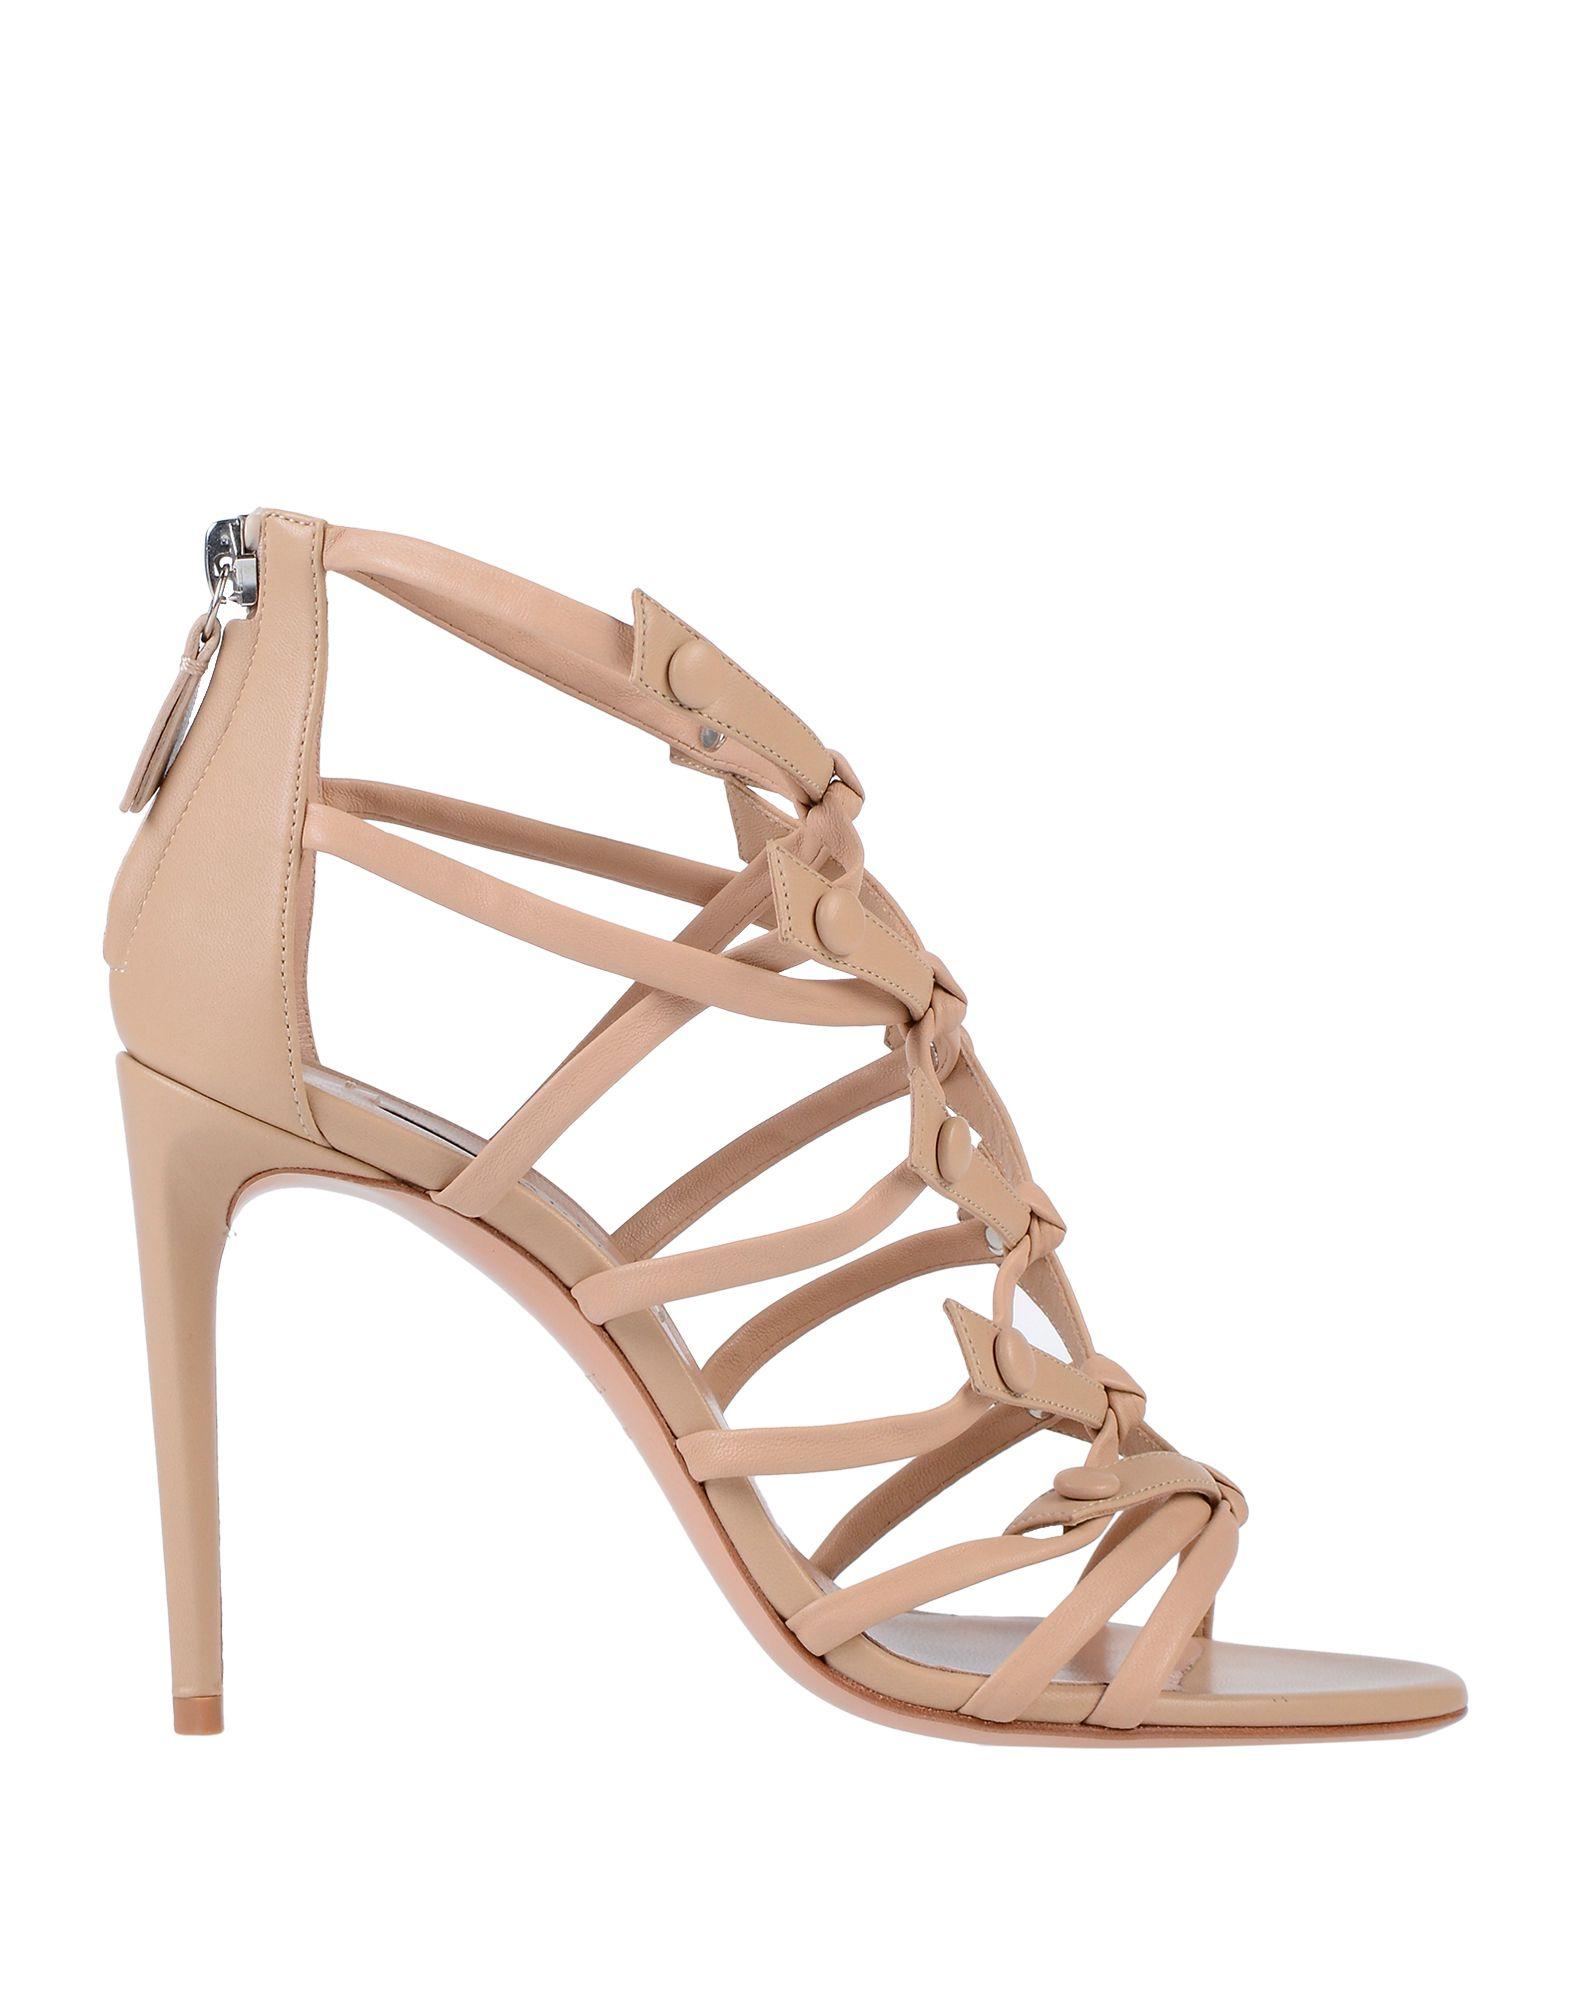 Scarpe Casadei Donna - Acquista online su YOOX 1a61eba8ab2